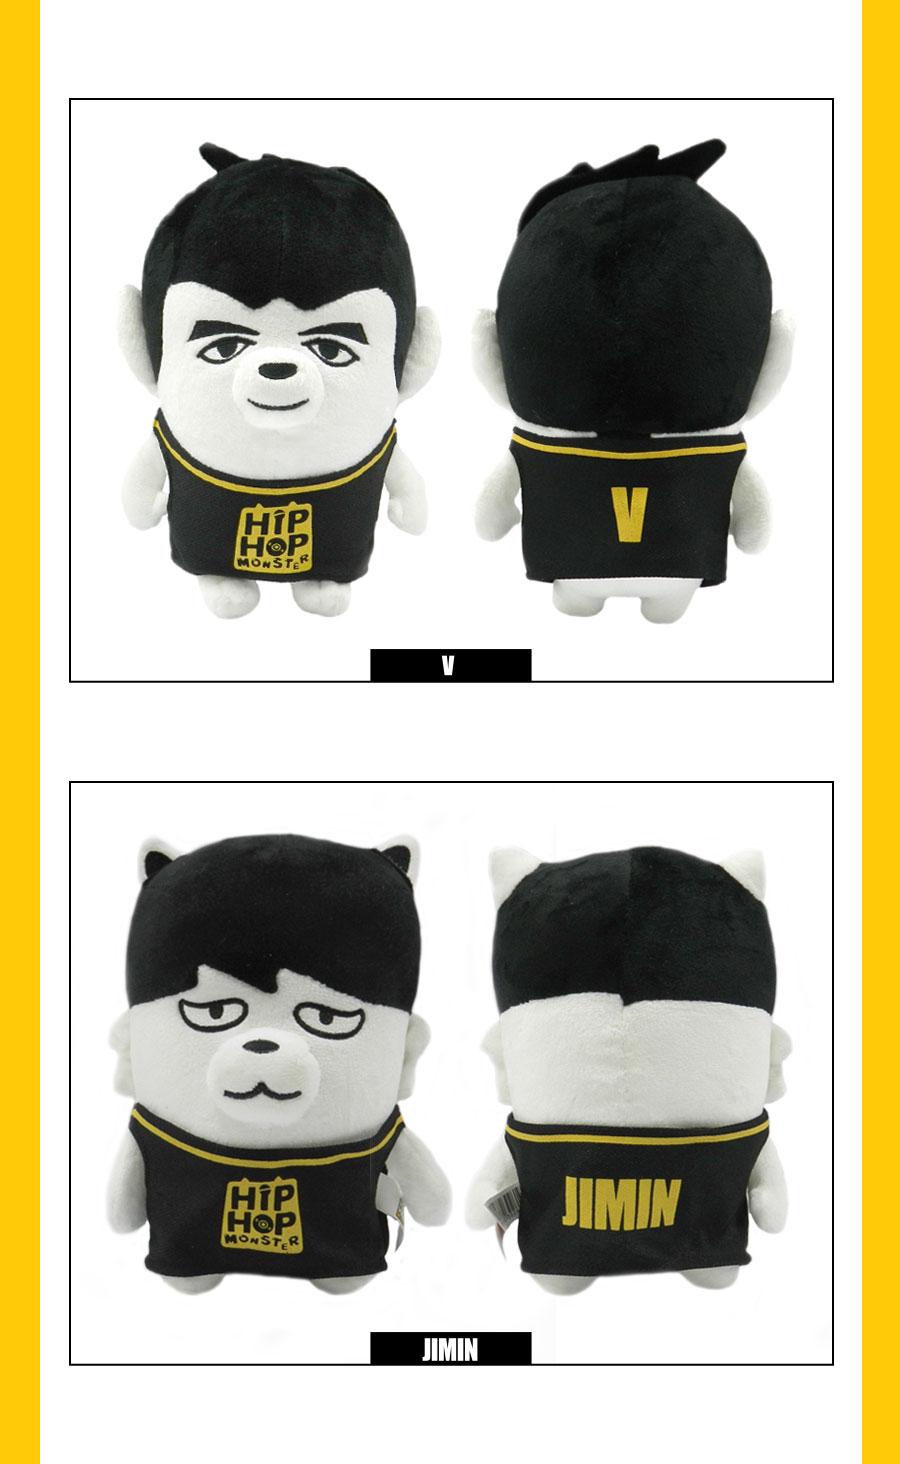 BTS HIPHOP MONSTER Plush doll